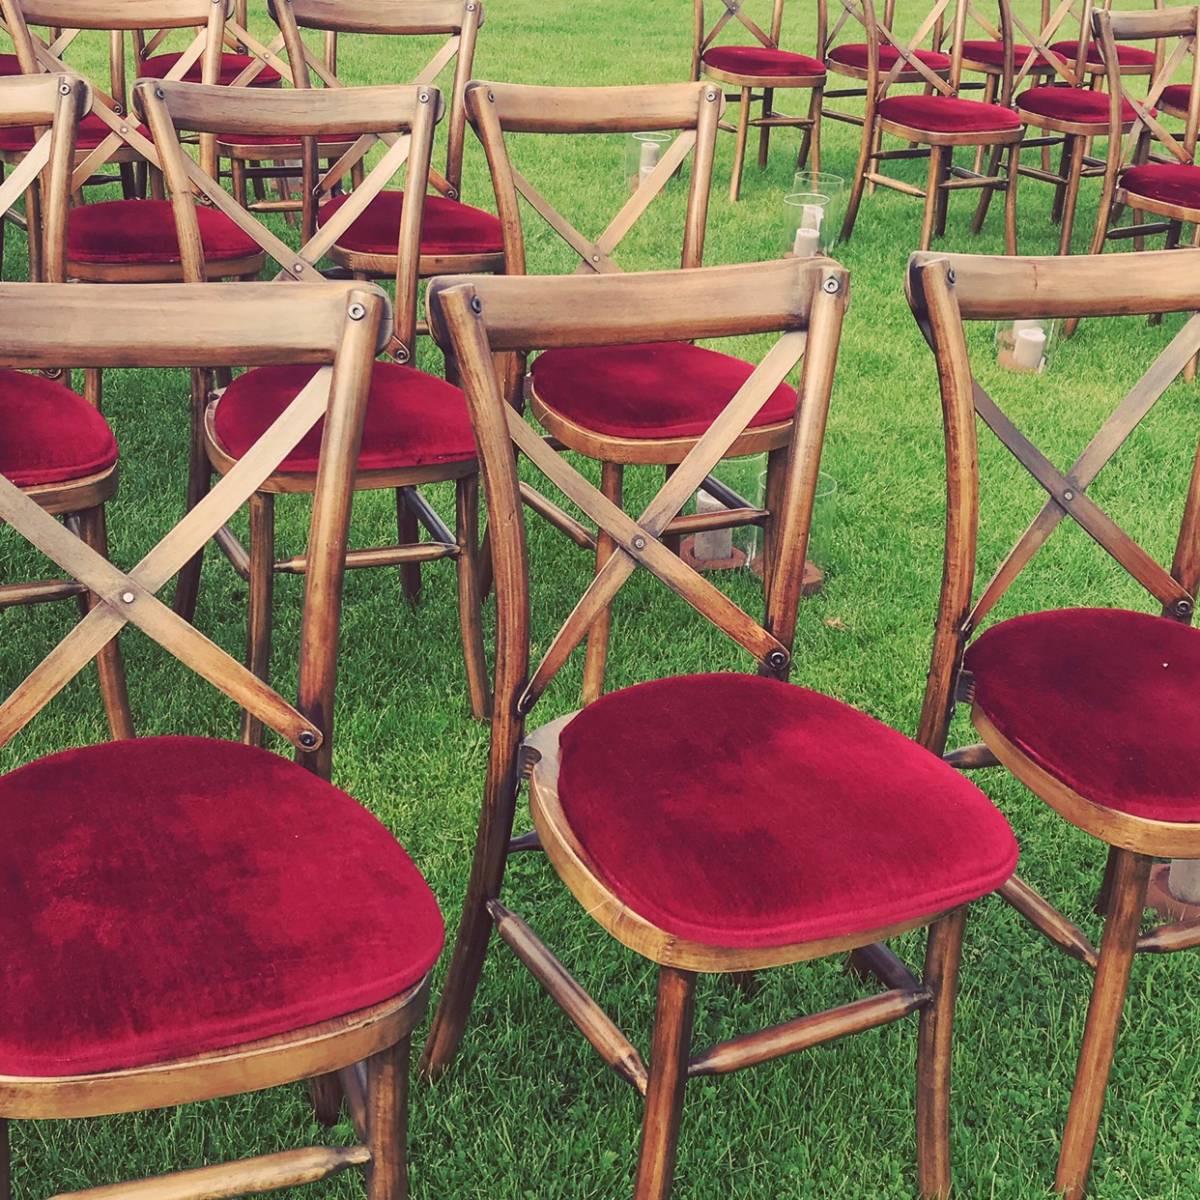 House of Weddings Domein t Eikennest Feestzaal West-Vlaanderen Diksmuide Beerst 3